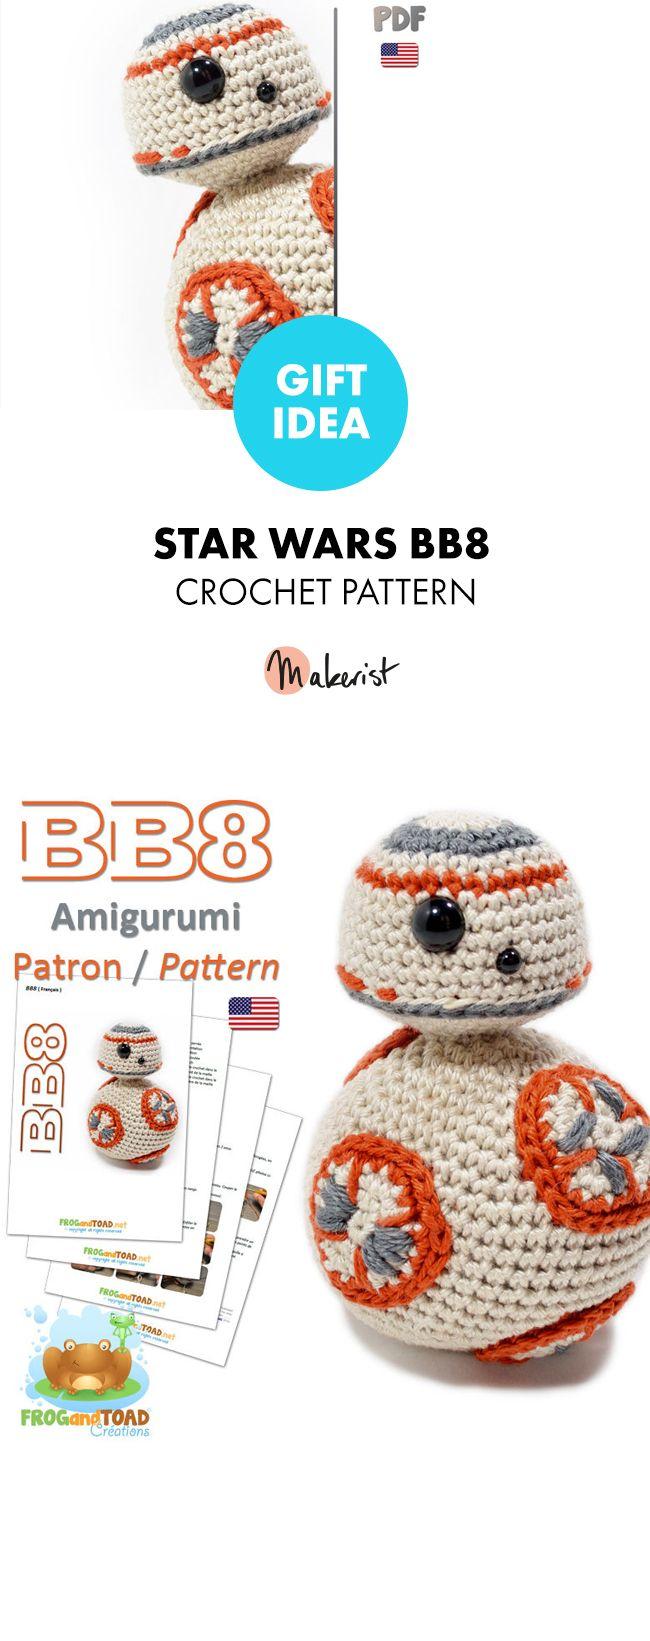 Pin de Lucy Burns en Knitting and crochet | Pinterest | Tejidos de ...